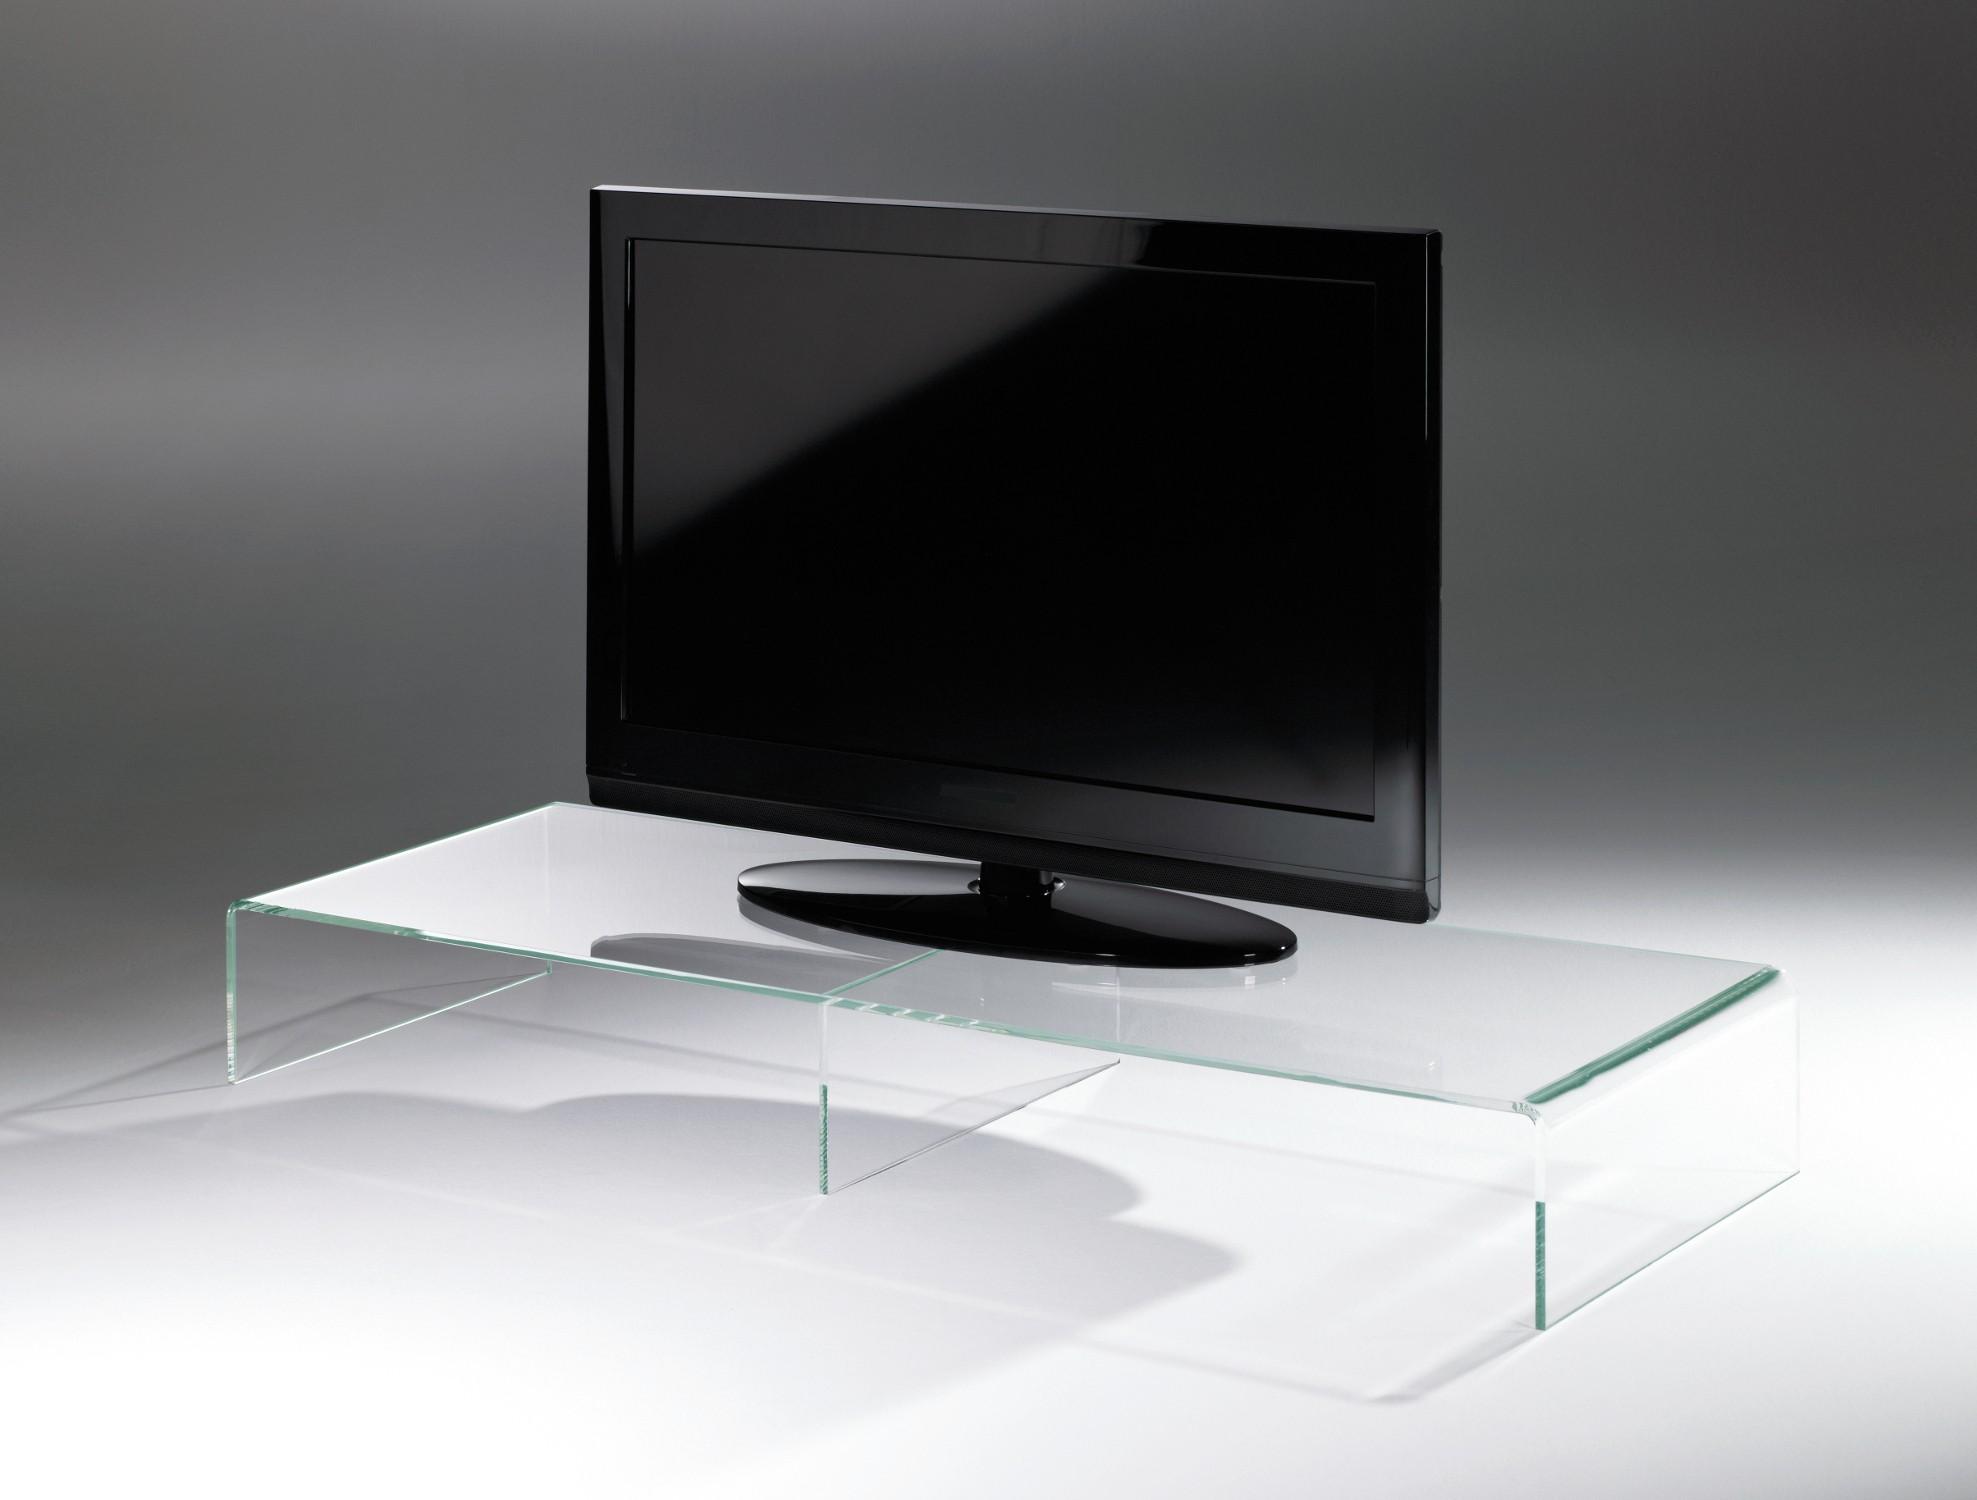 tv konsole new york breite 120 cm acrylglas wohnen tv m bel tv lowboards. Black Bedroom Furniture Sets. Home Design Ideas